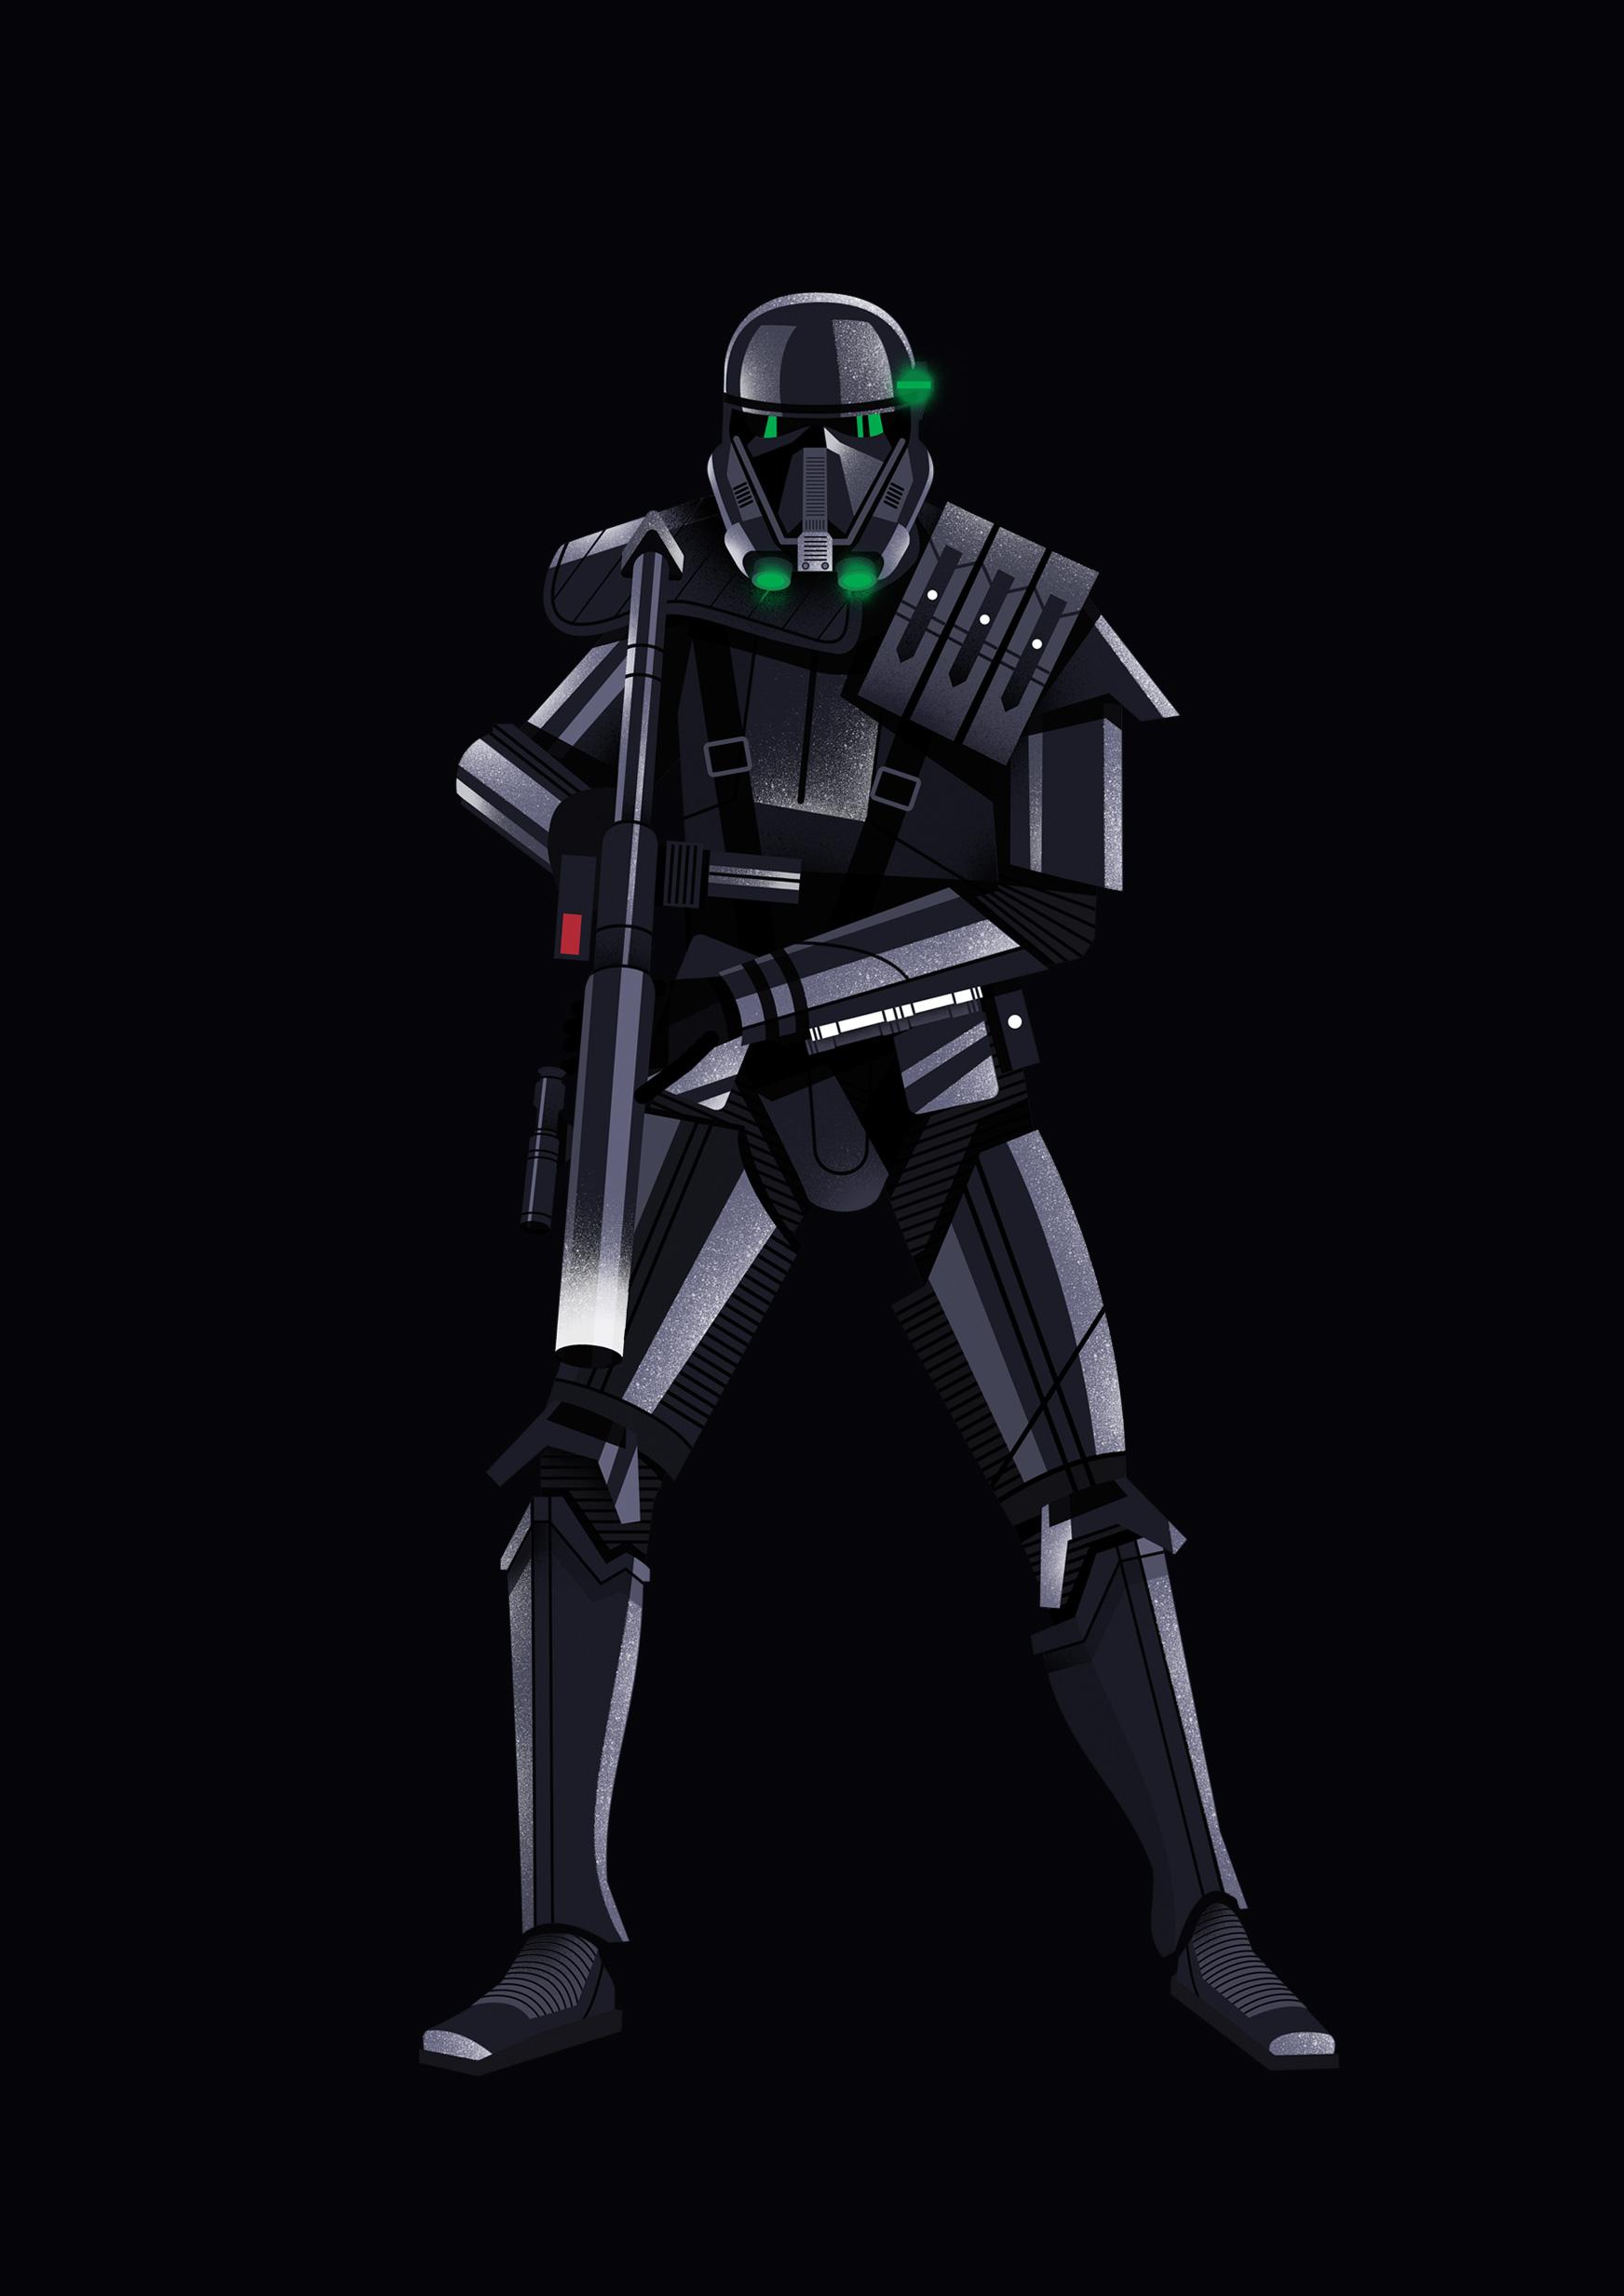 freelance illustrator dale edwin murray star wars rogue one disney complex illustration death trooper